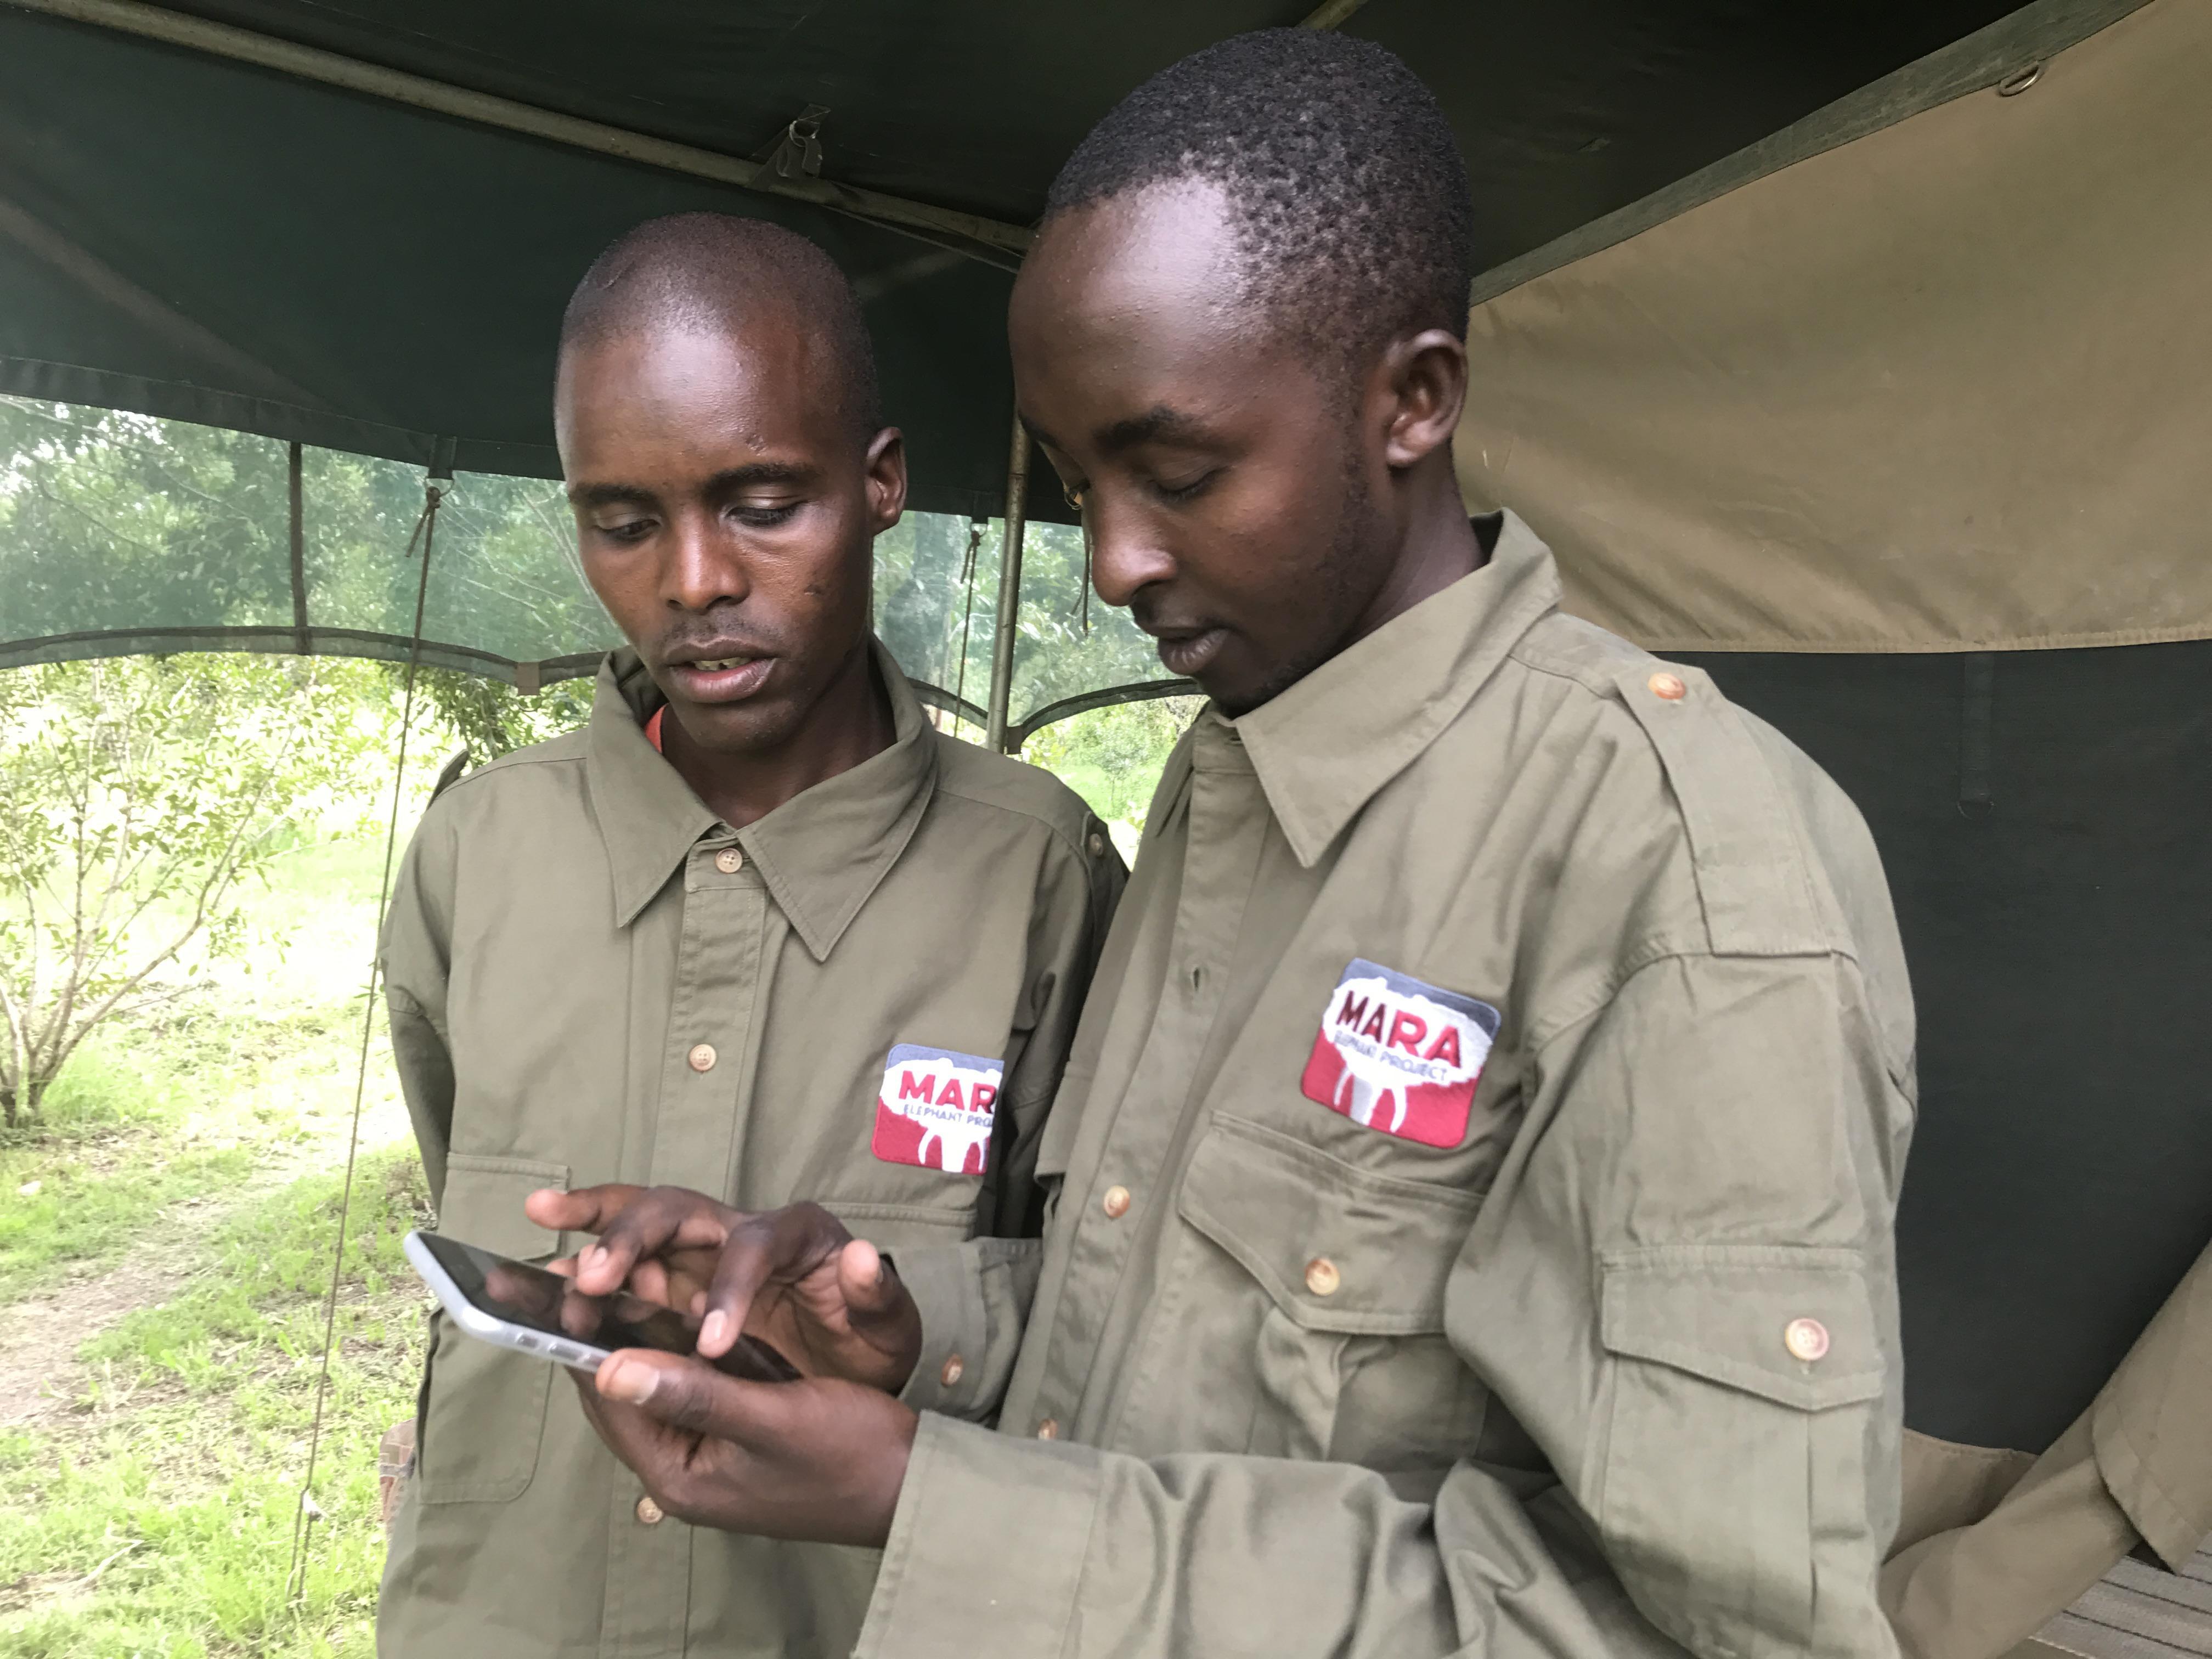 Mara Rangers Tracking Eles